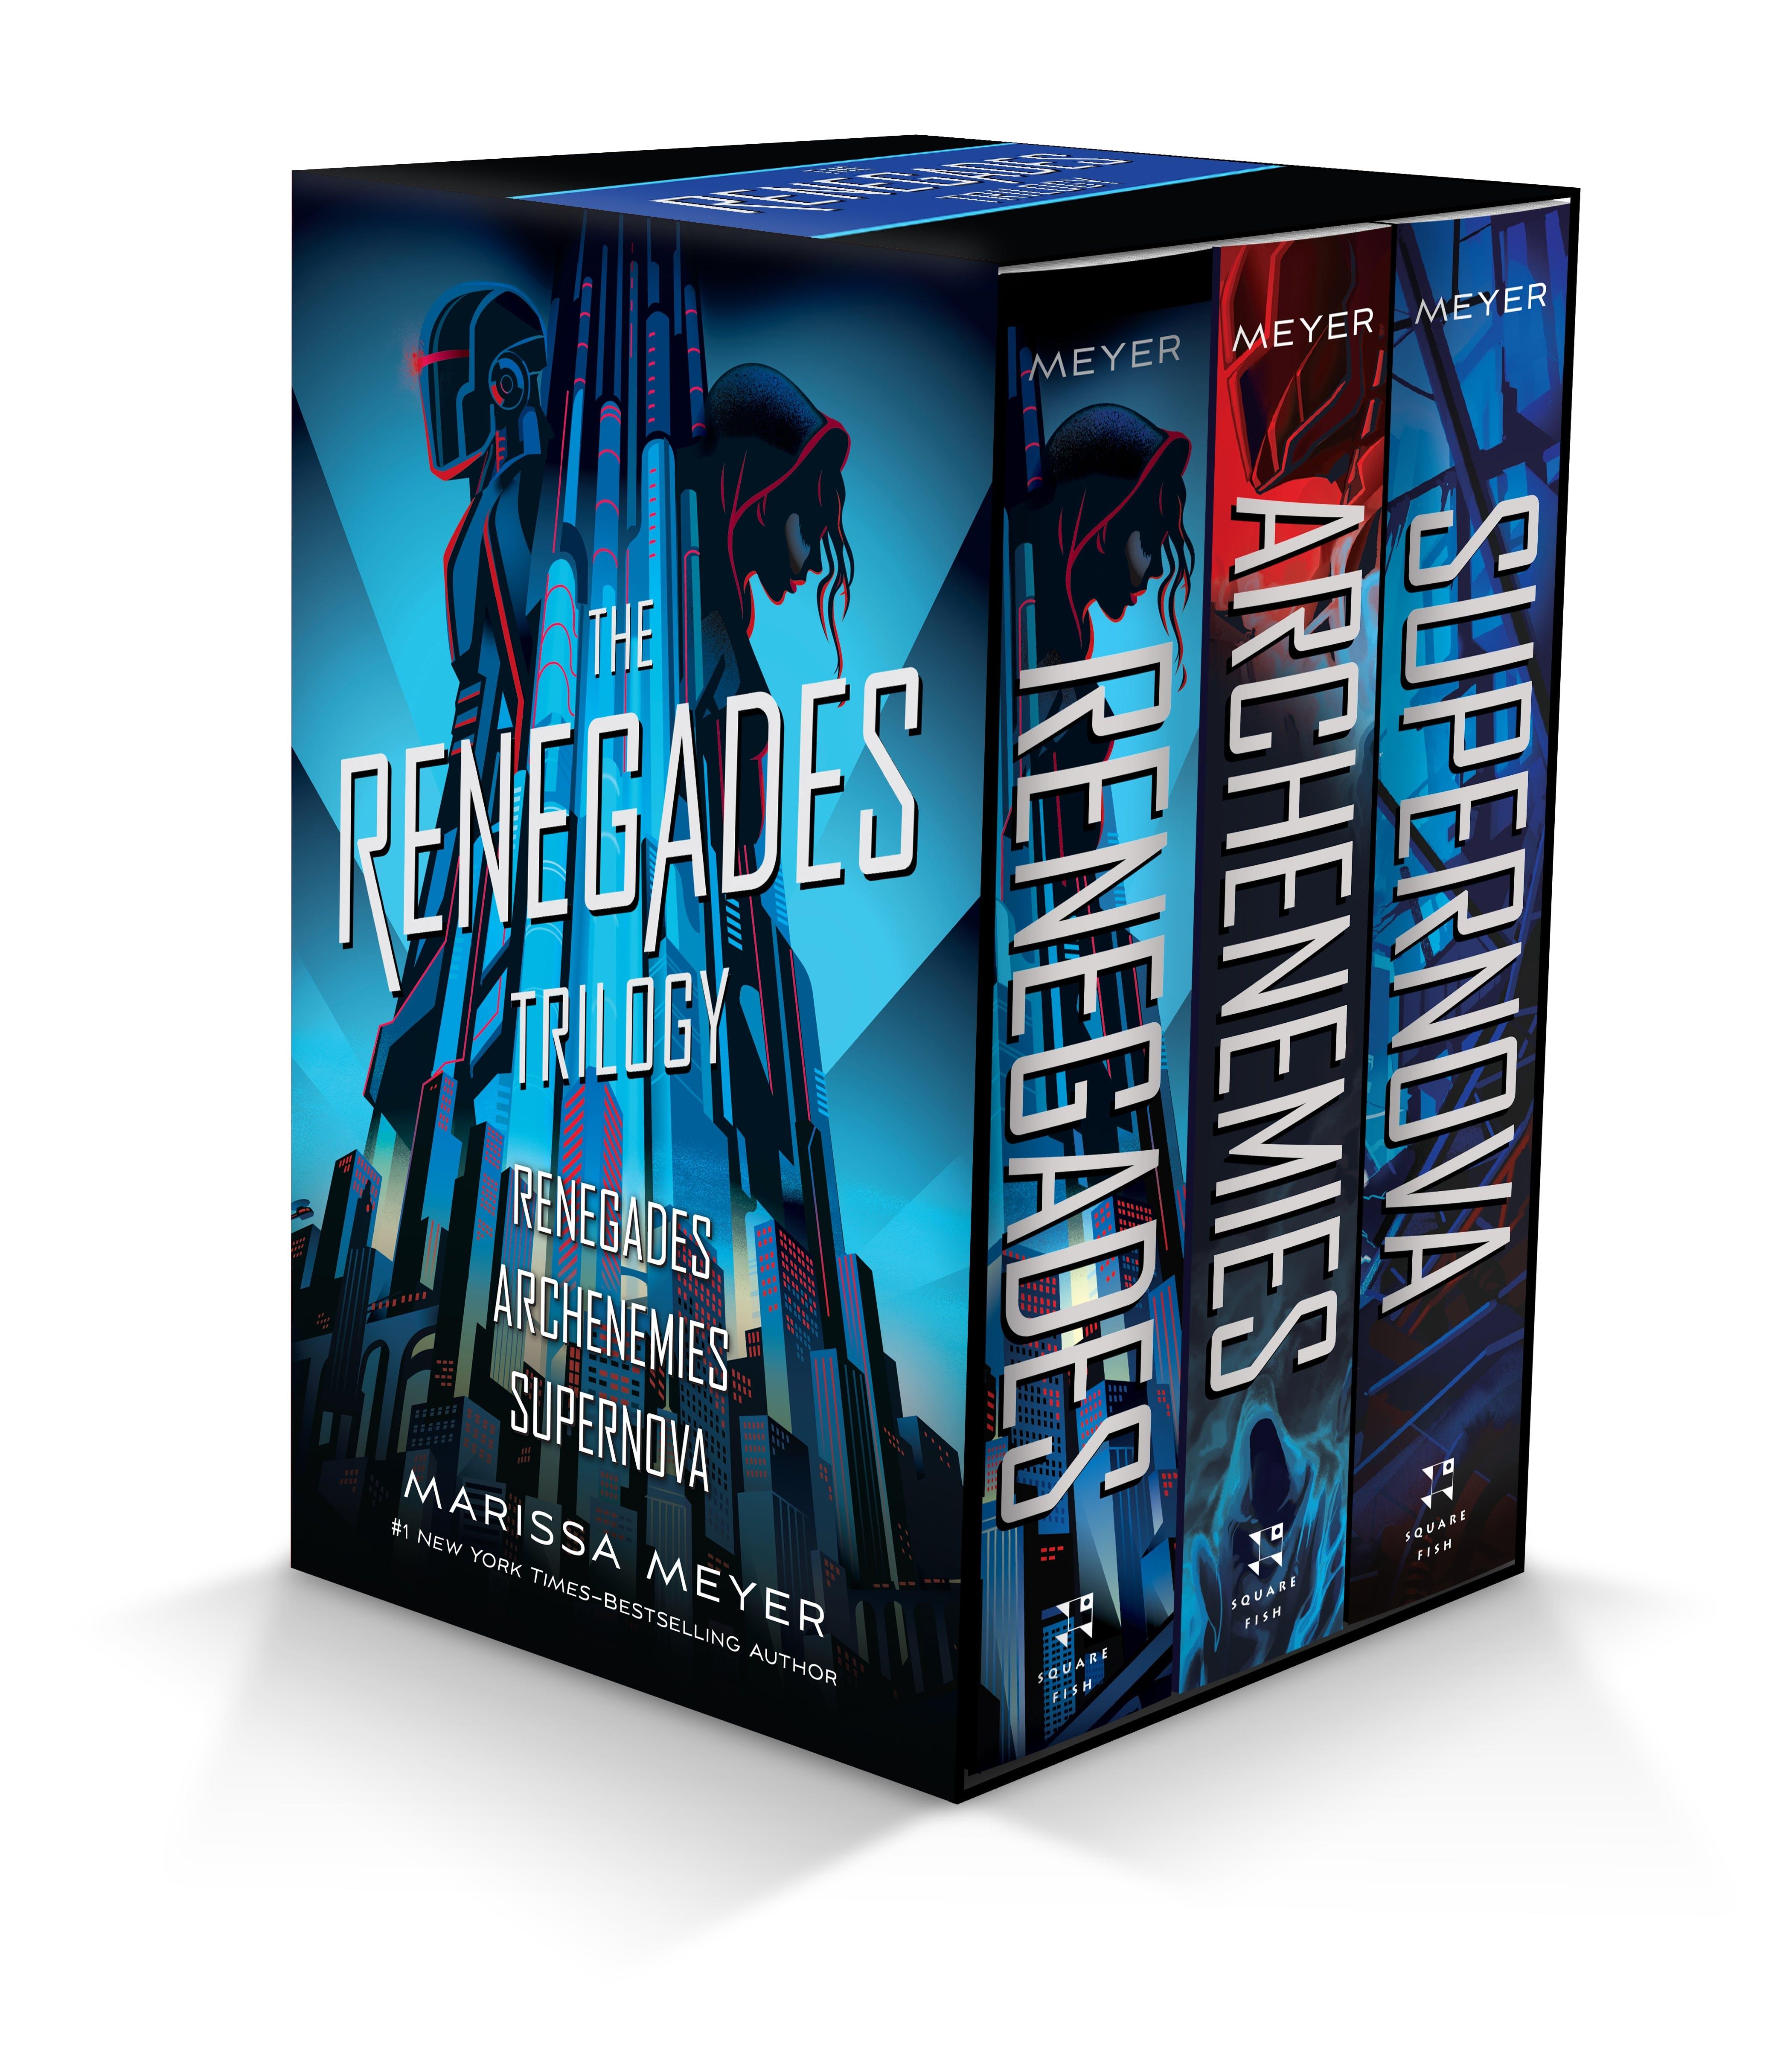 Image of Renegades Series 3-book boxed set